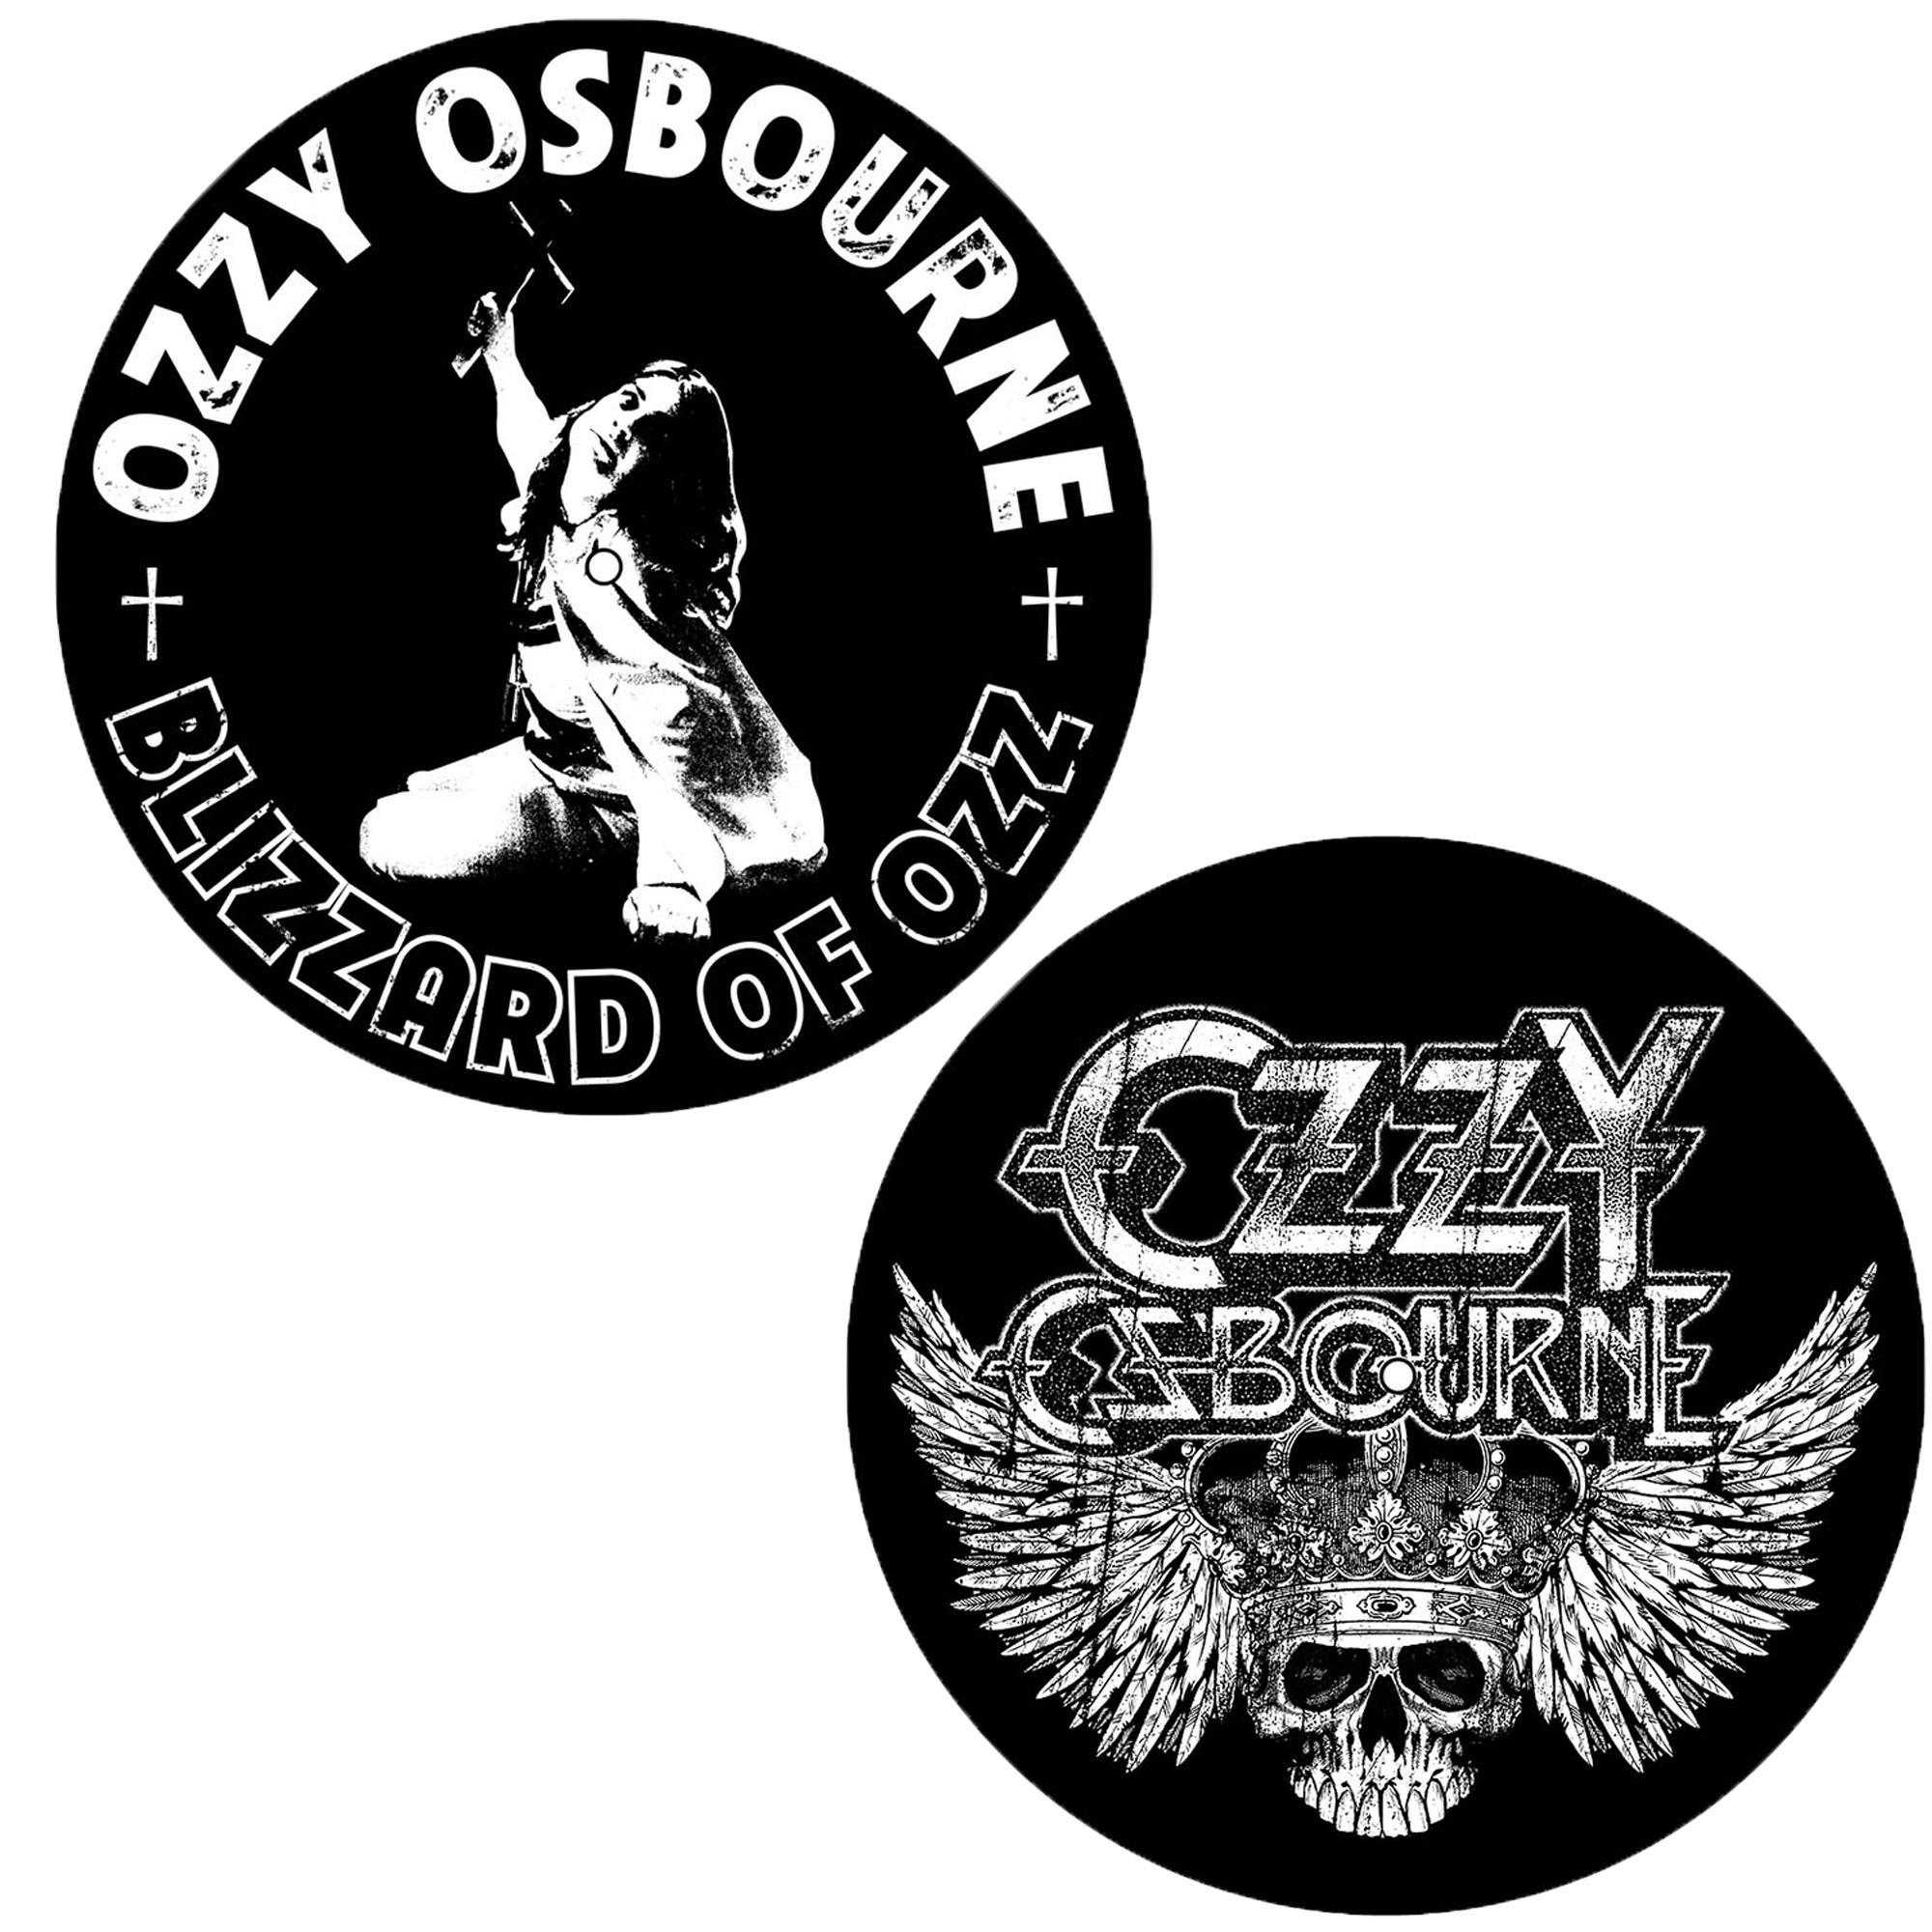 Blizzard Of Ozz/Crest Slipmat Set